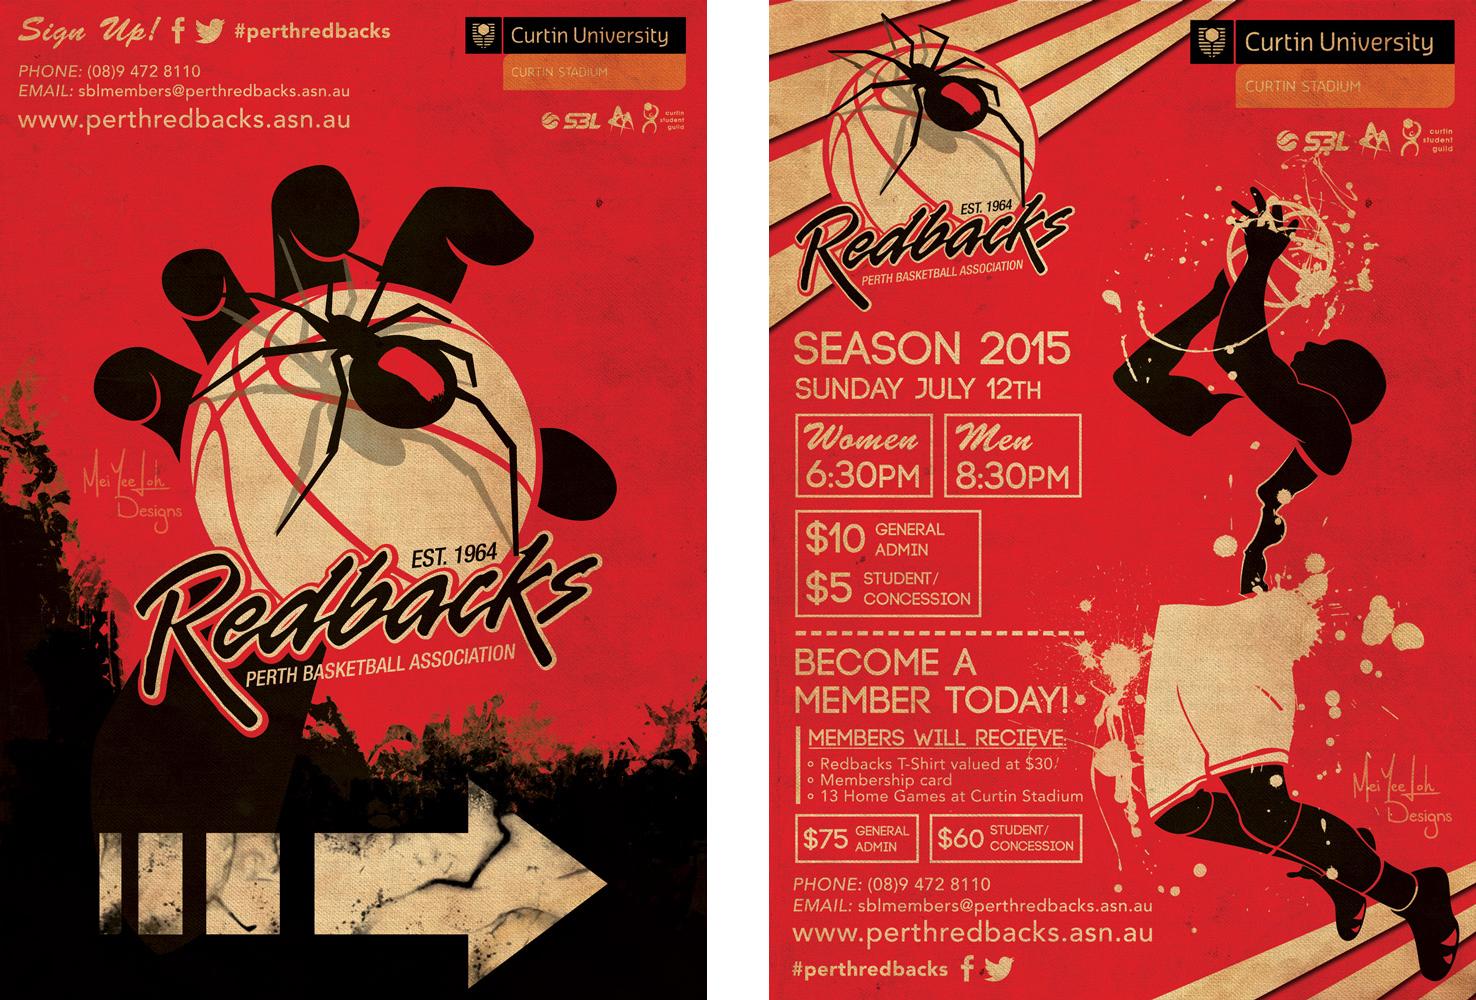 Perth Redbacks (Basketball Association) directional poster and season poster. (2015)